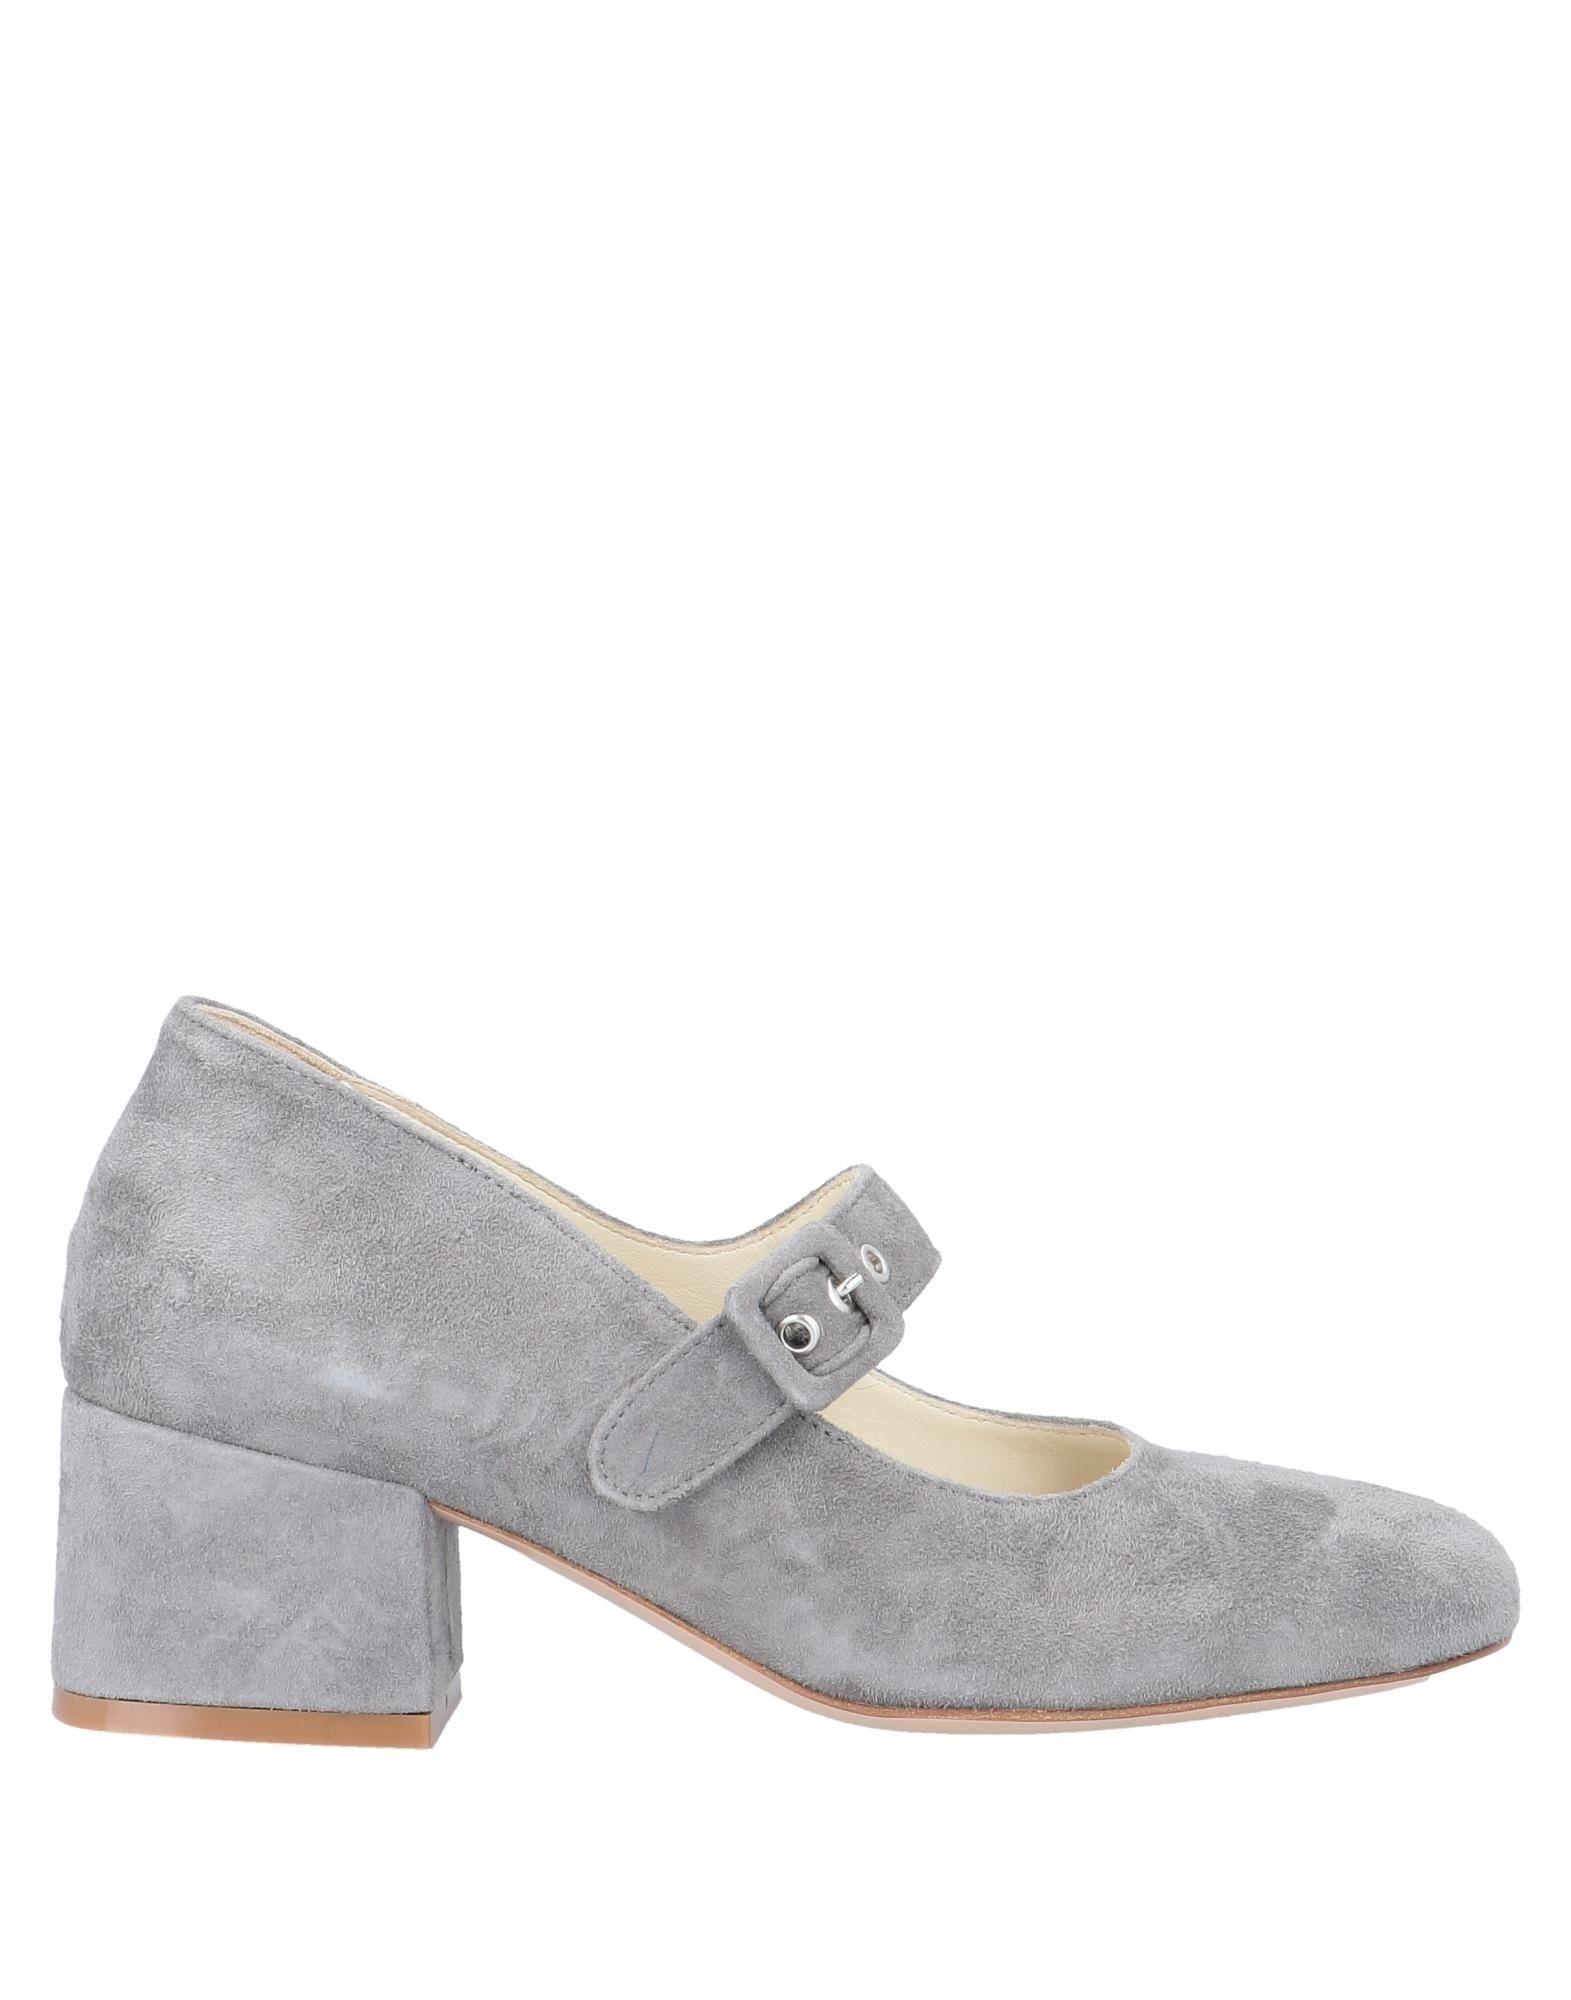 SAN CRISPINO Туфли цены онлайн